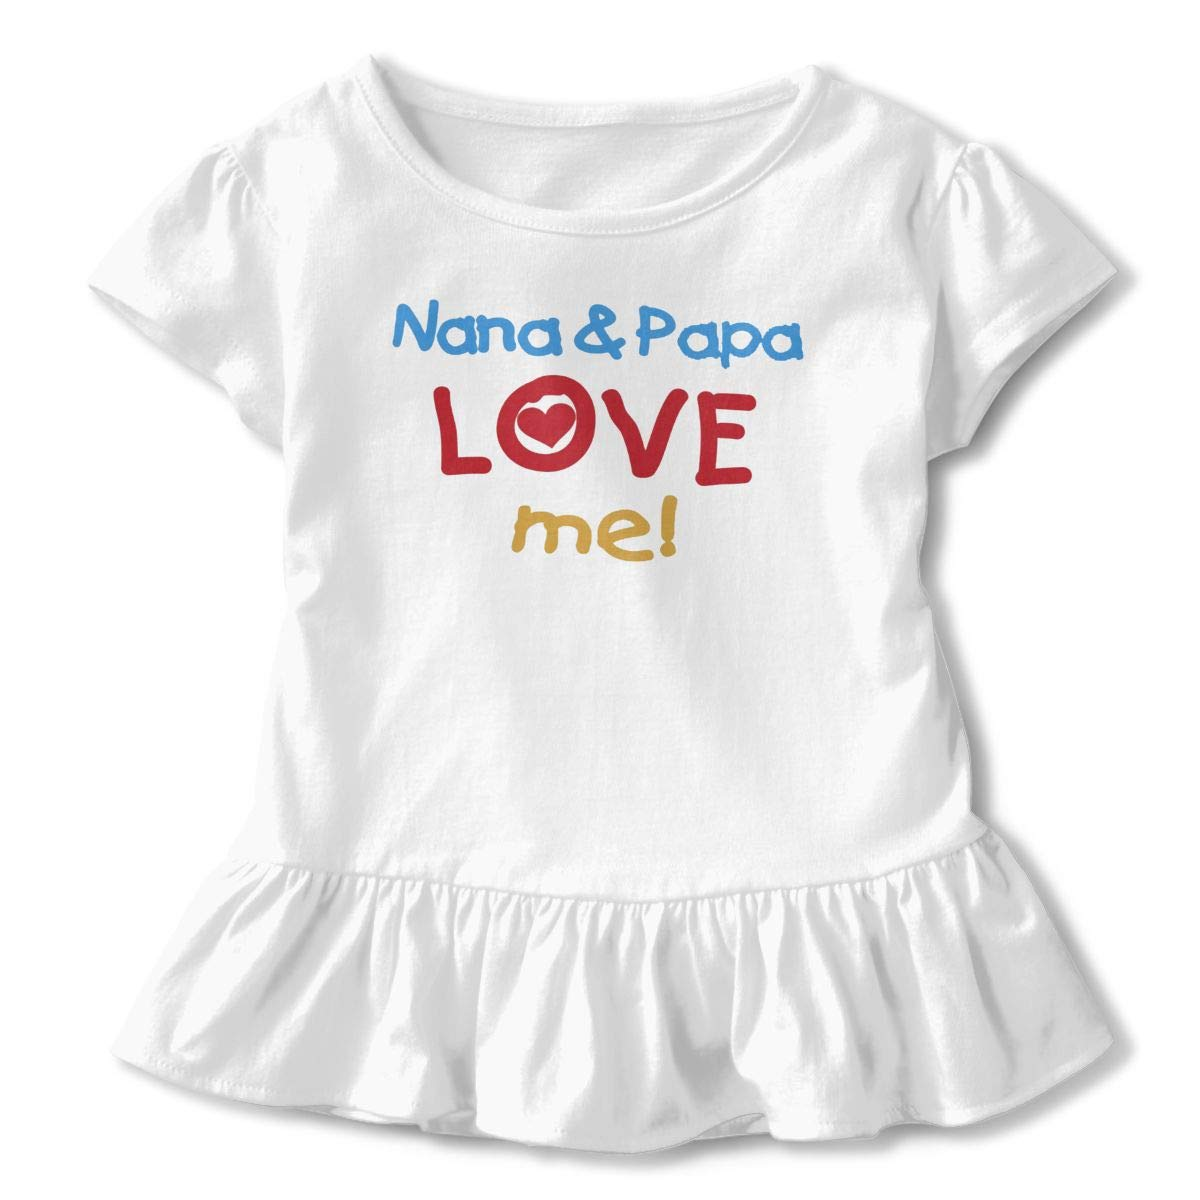 Nana and Papa Love Me Baby Flounces Skirts Kids Pretty T Shirt Dress Cotton Outfits